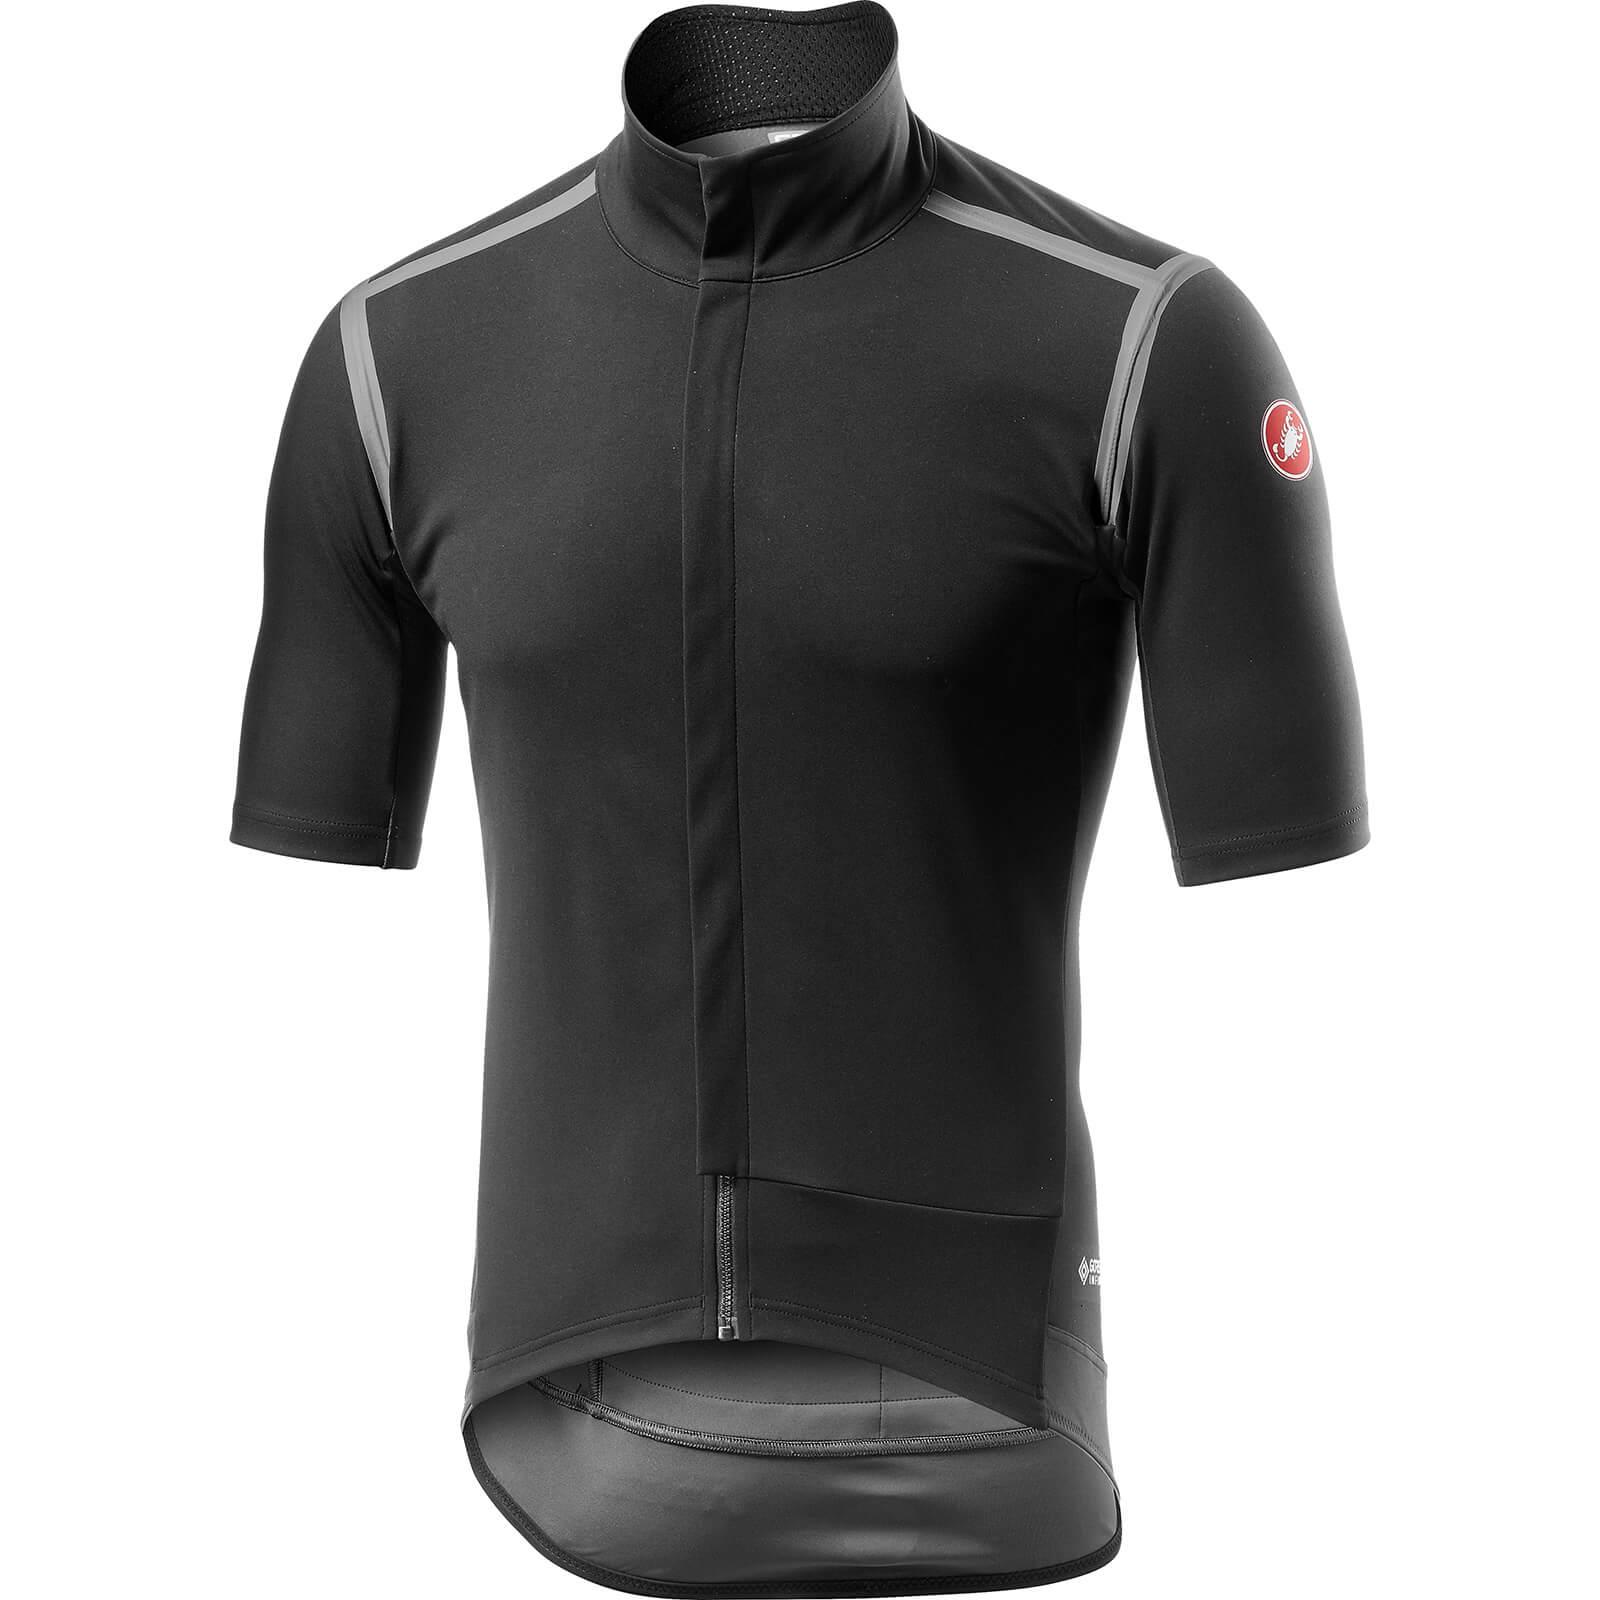 Image of Castelli Gabba RoS Jersey - XL - Light Black